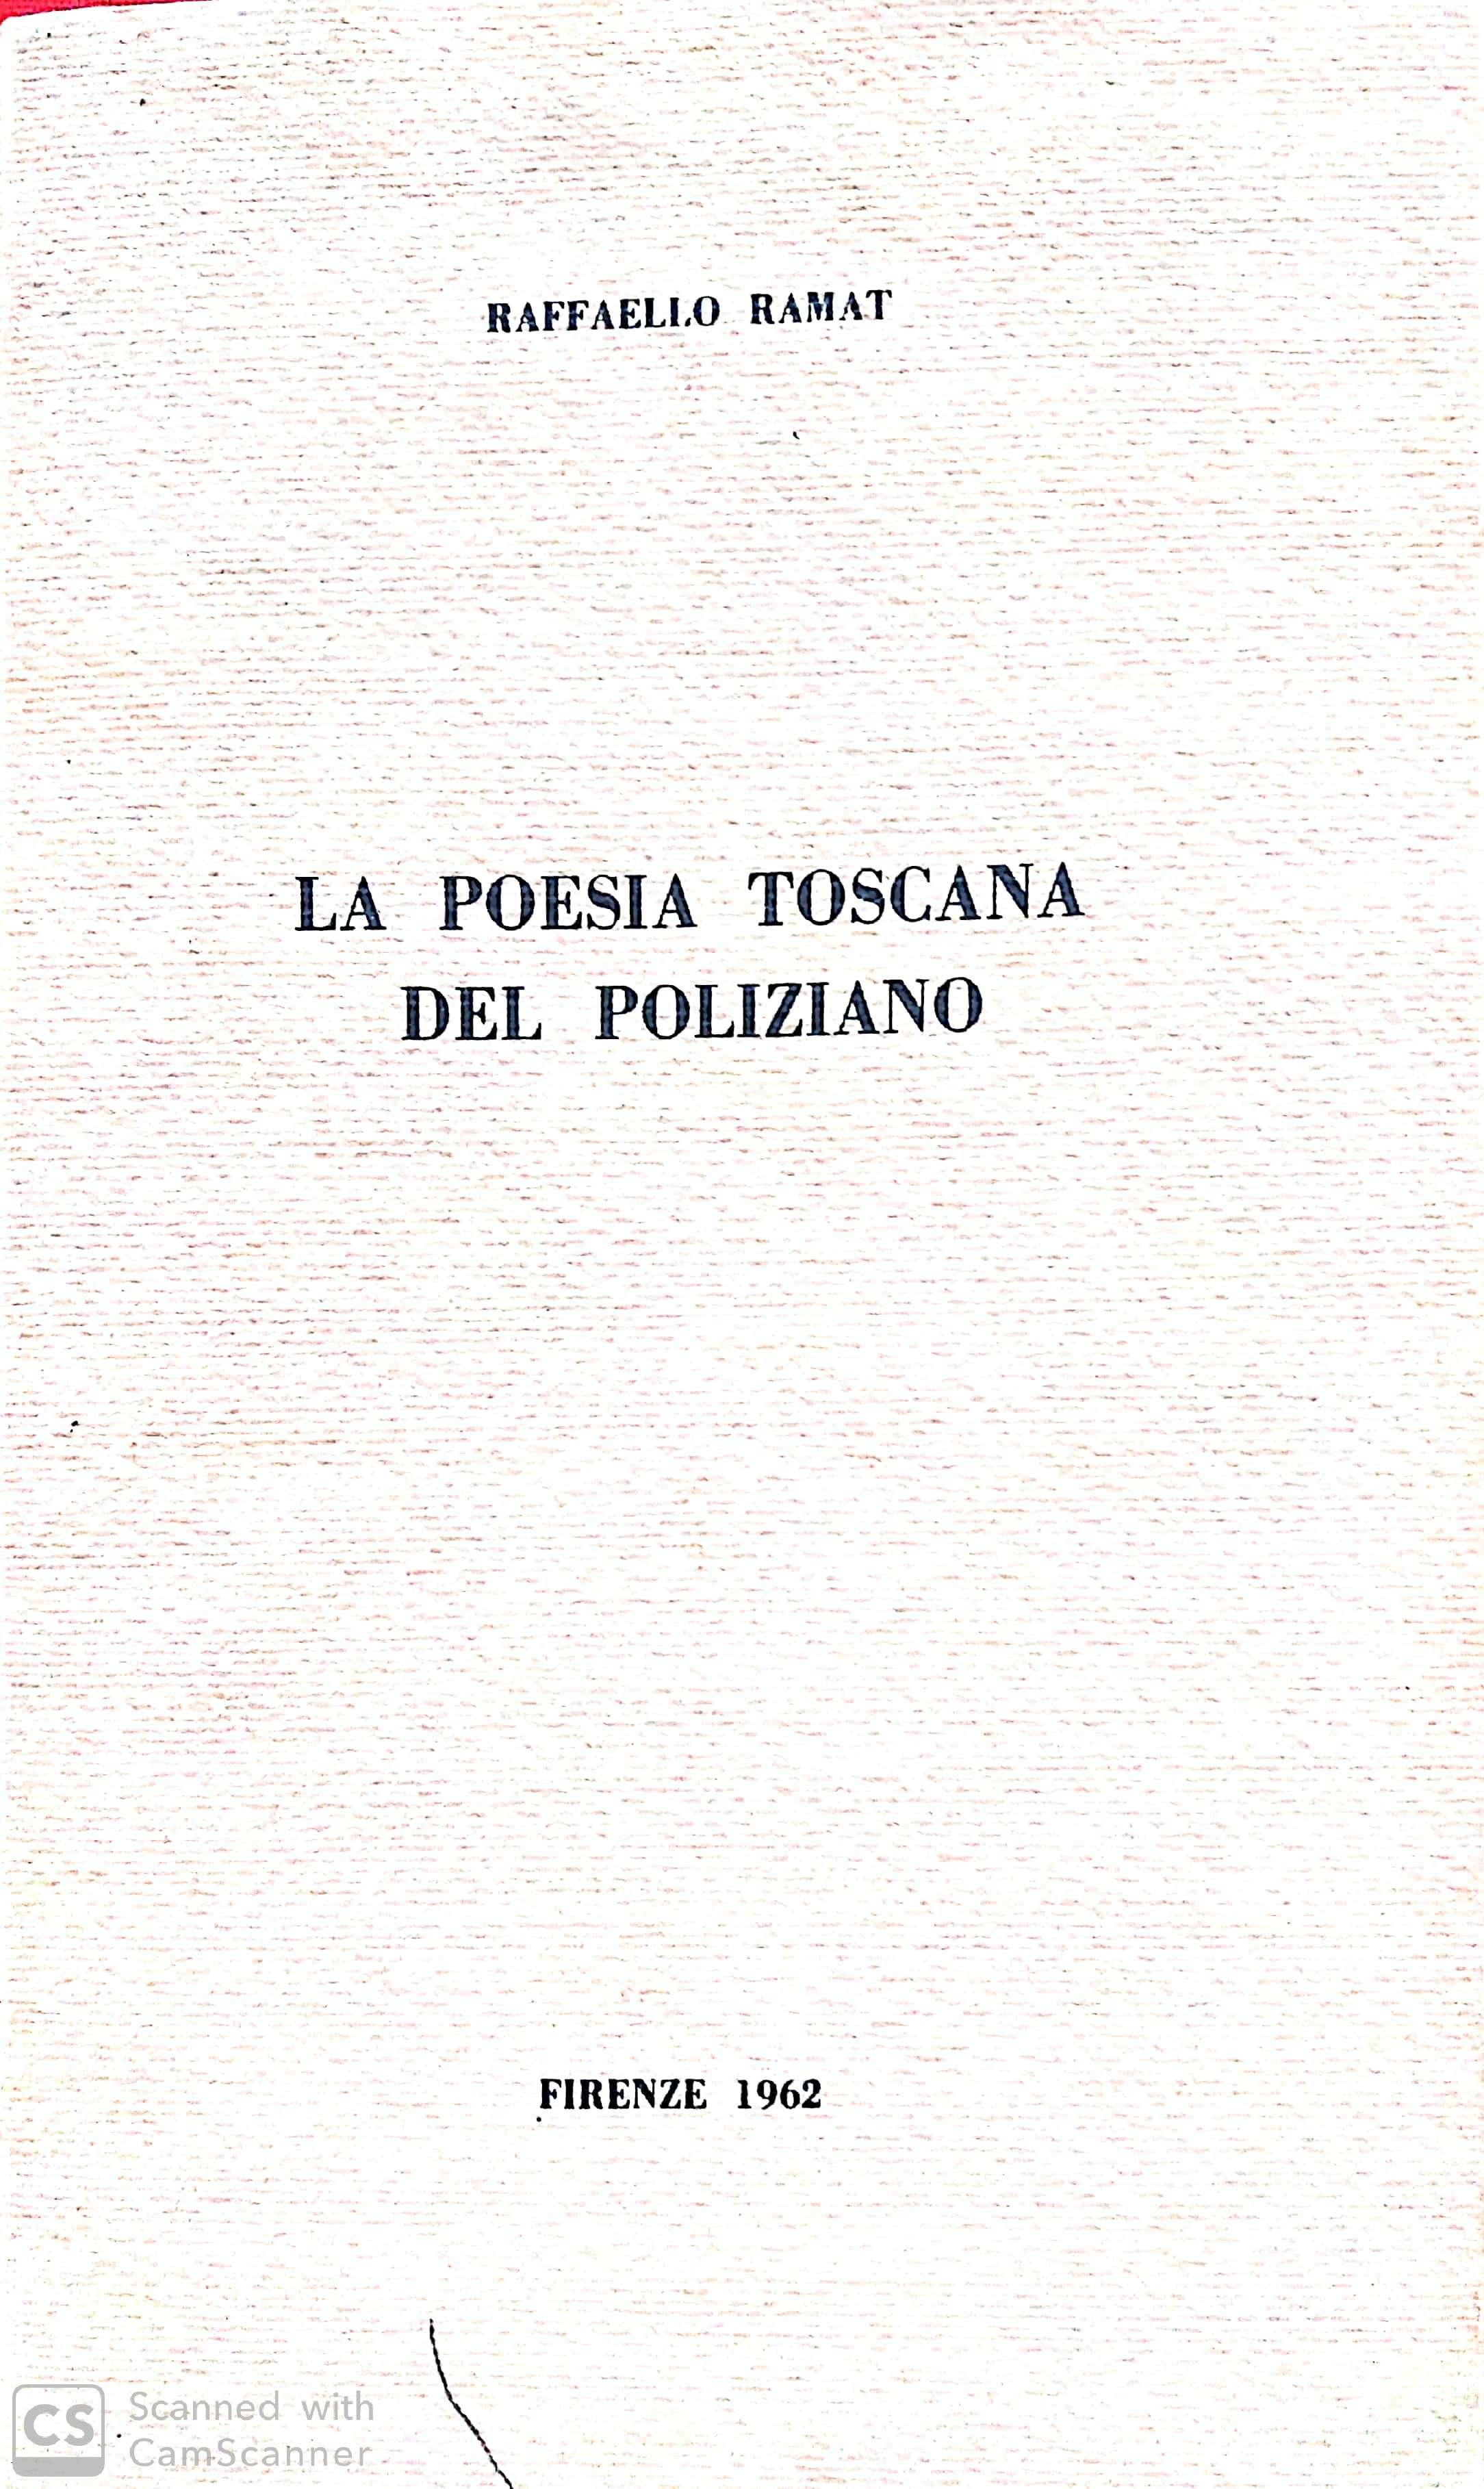 La poesia toscana del Poliziano